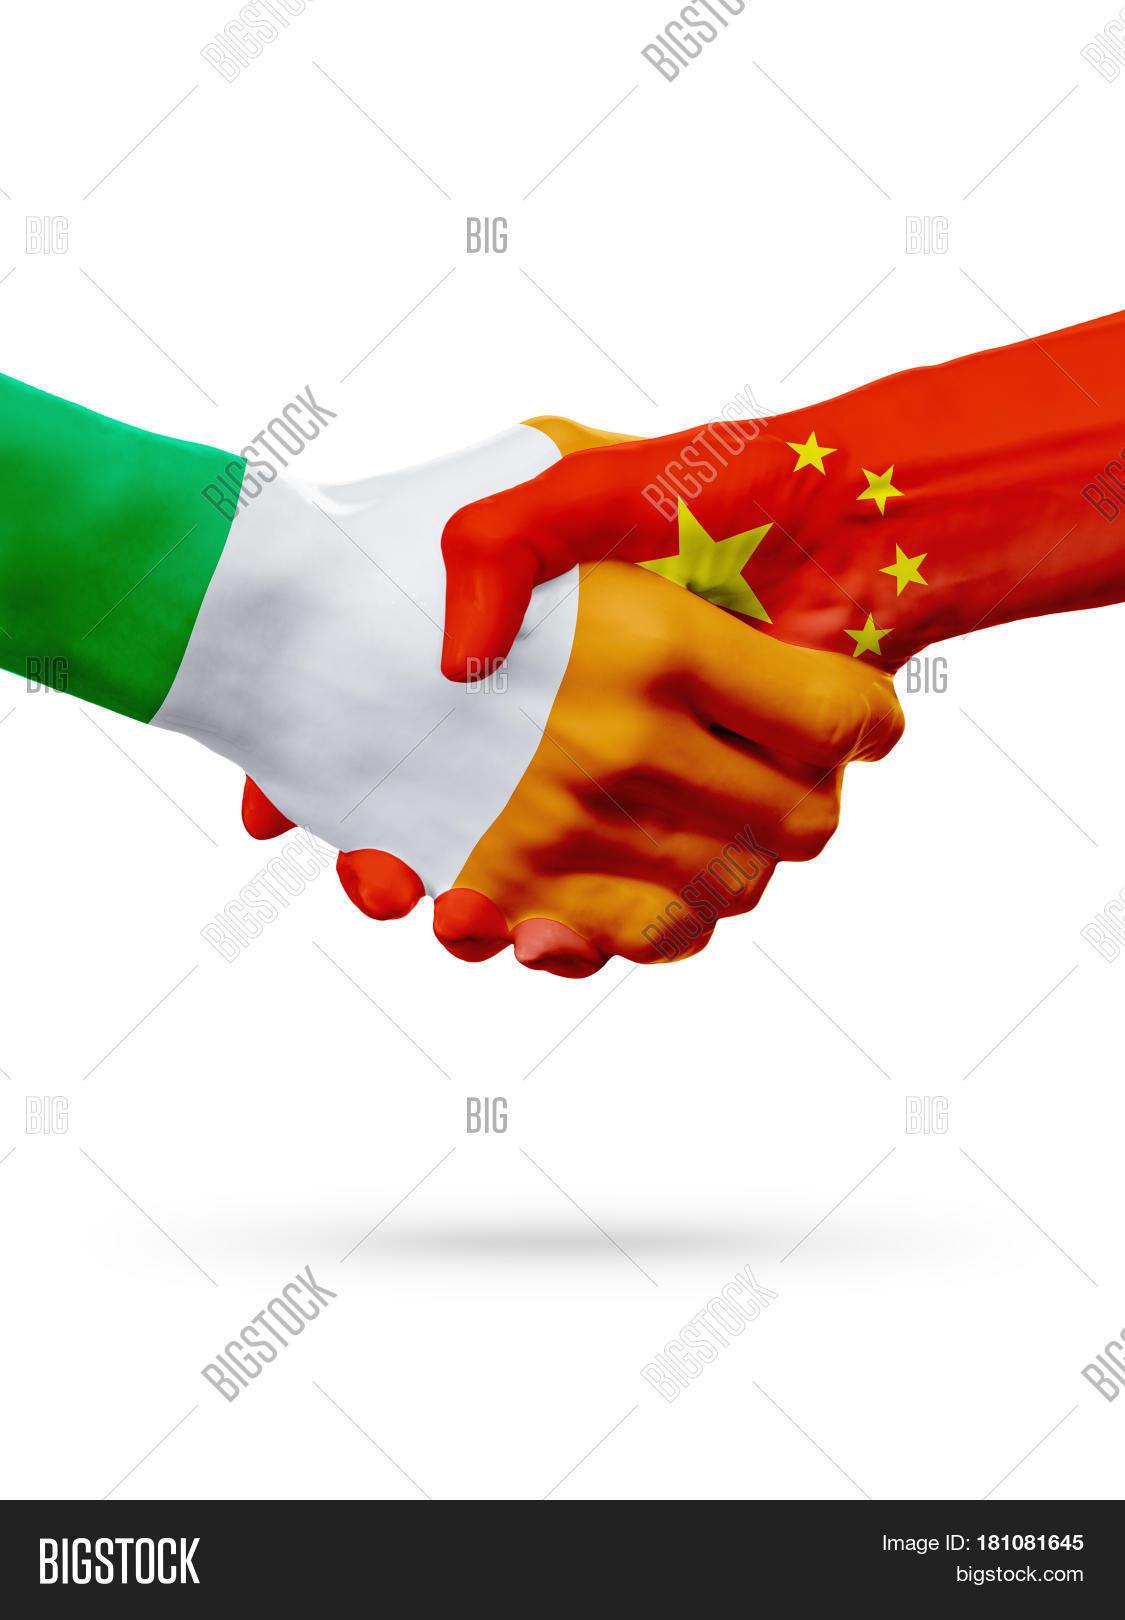 Flags Ireland China Countries Image & Photo | Bigstock